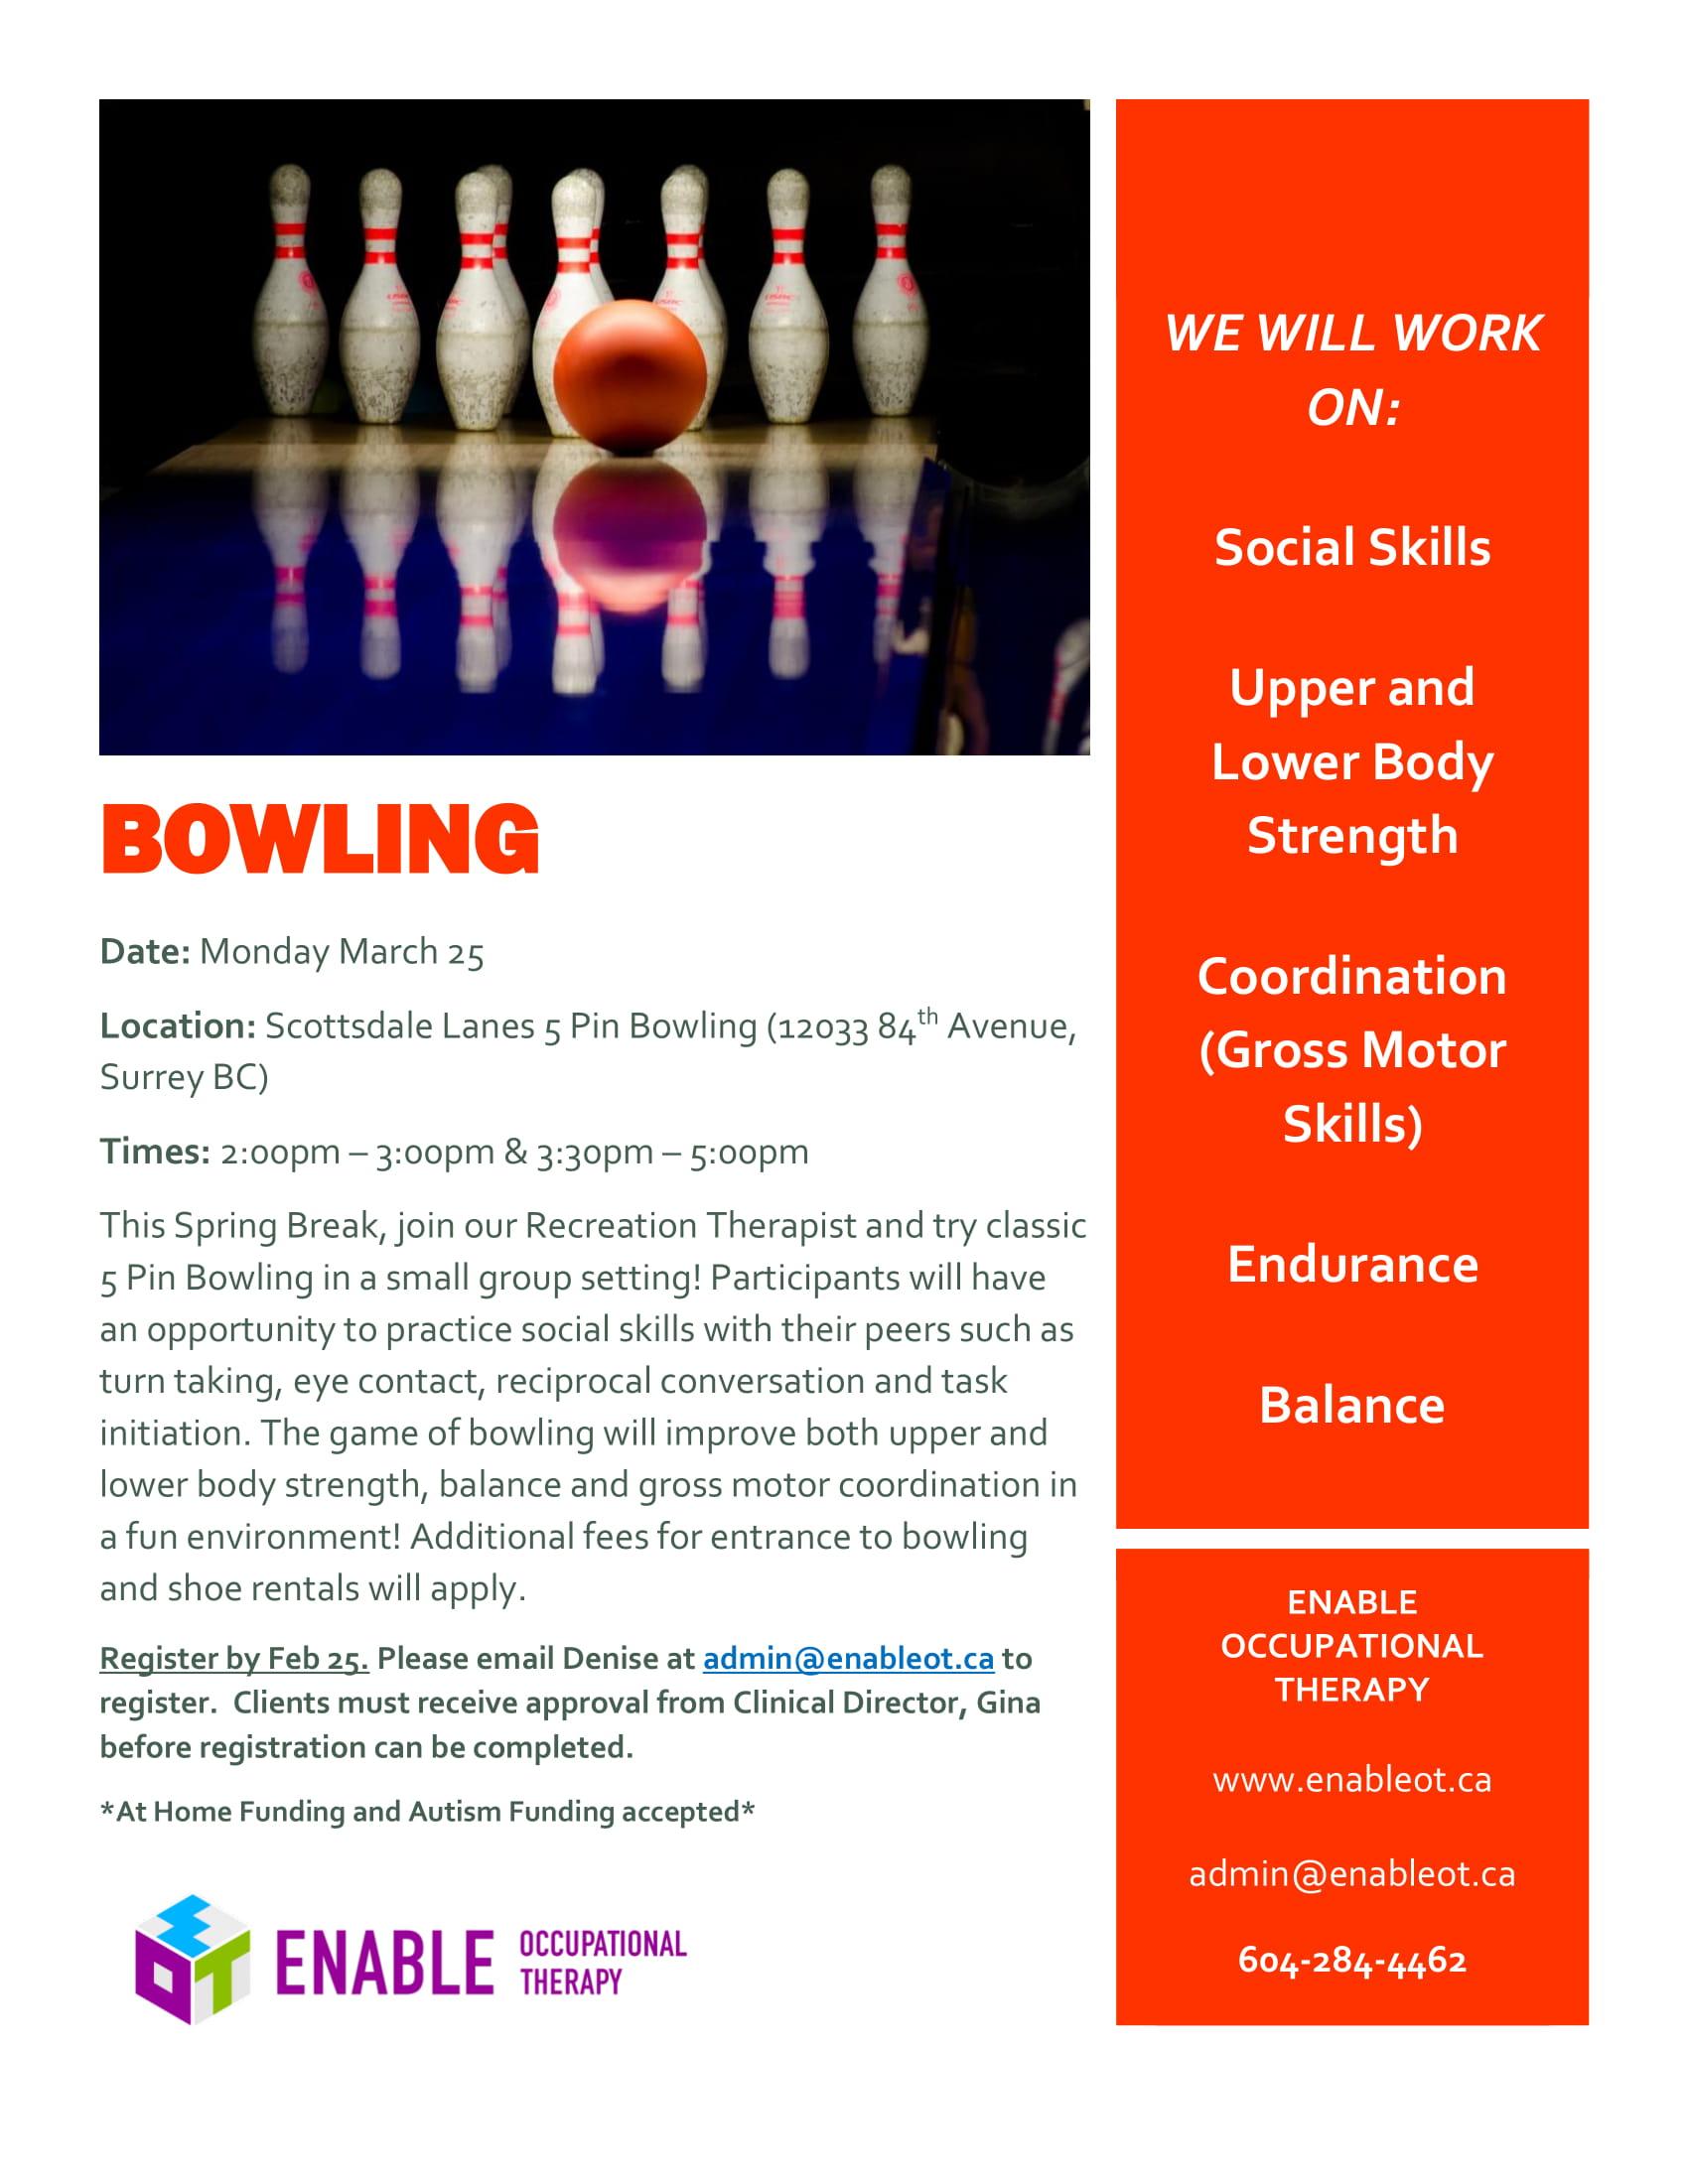 Bowling Poster 2019-1.jpg